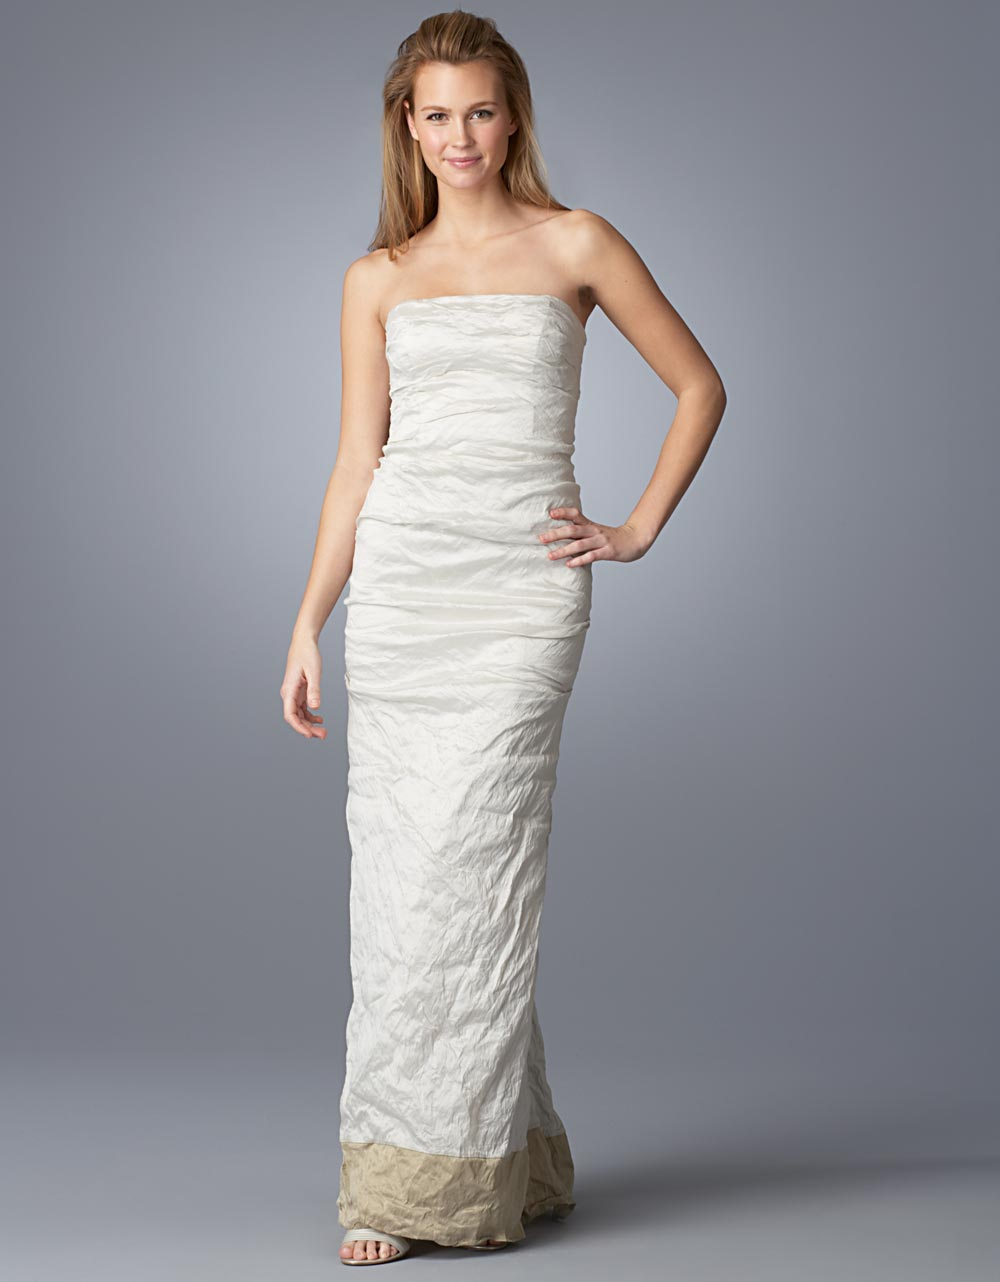 Nicole miller stretch metallic taffeta strapless gown in for Nicole miller strapless wedding dress